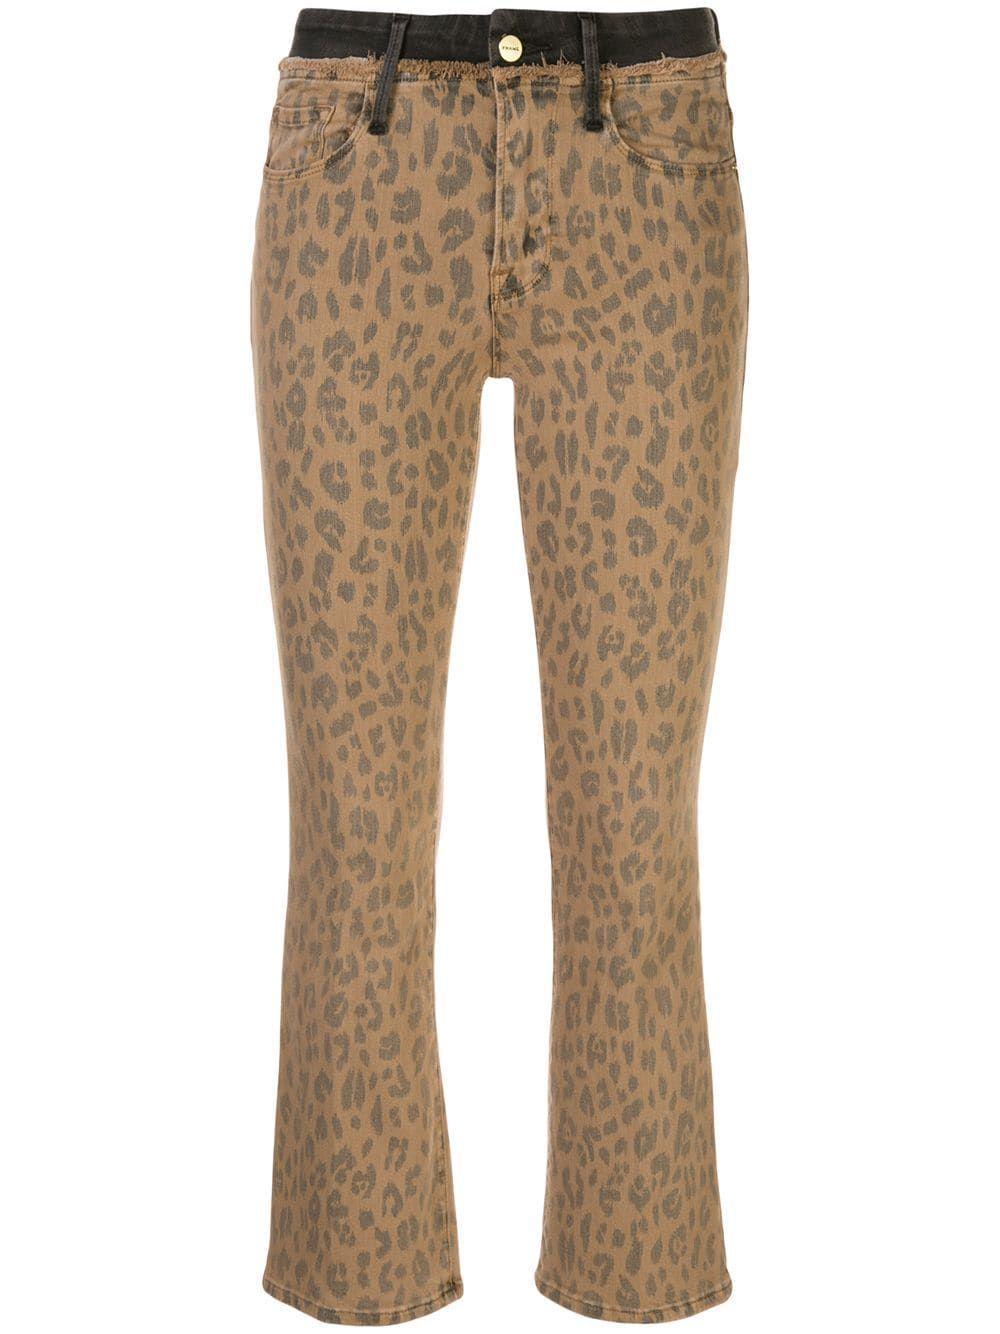 Le Crop Mini Boot Cheetah Jean Item # LCMBFCW403